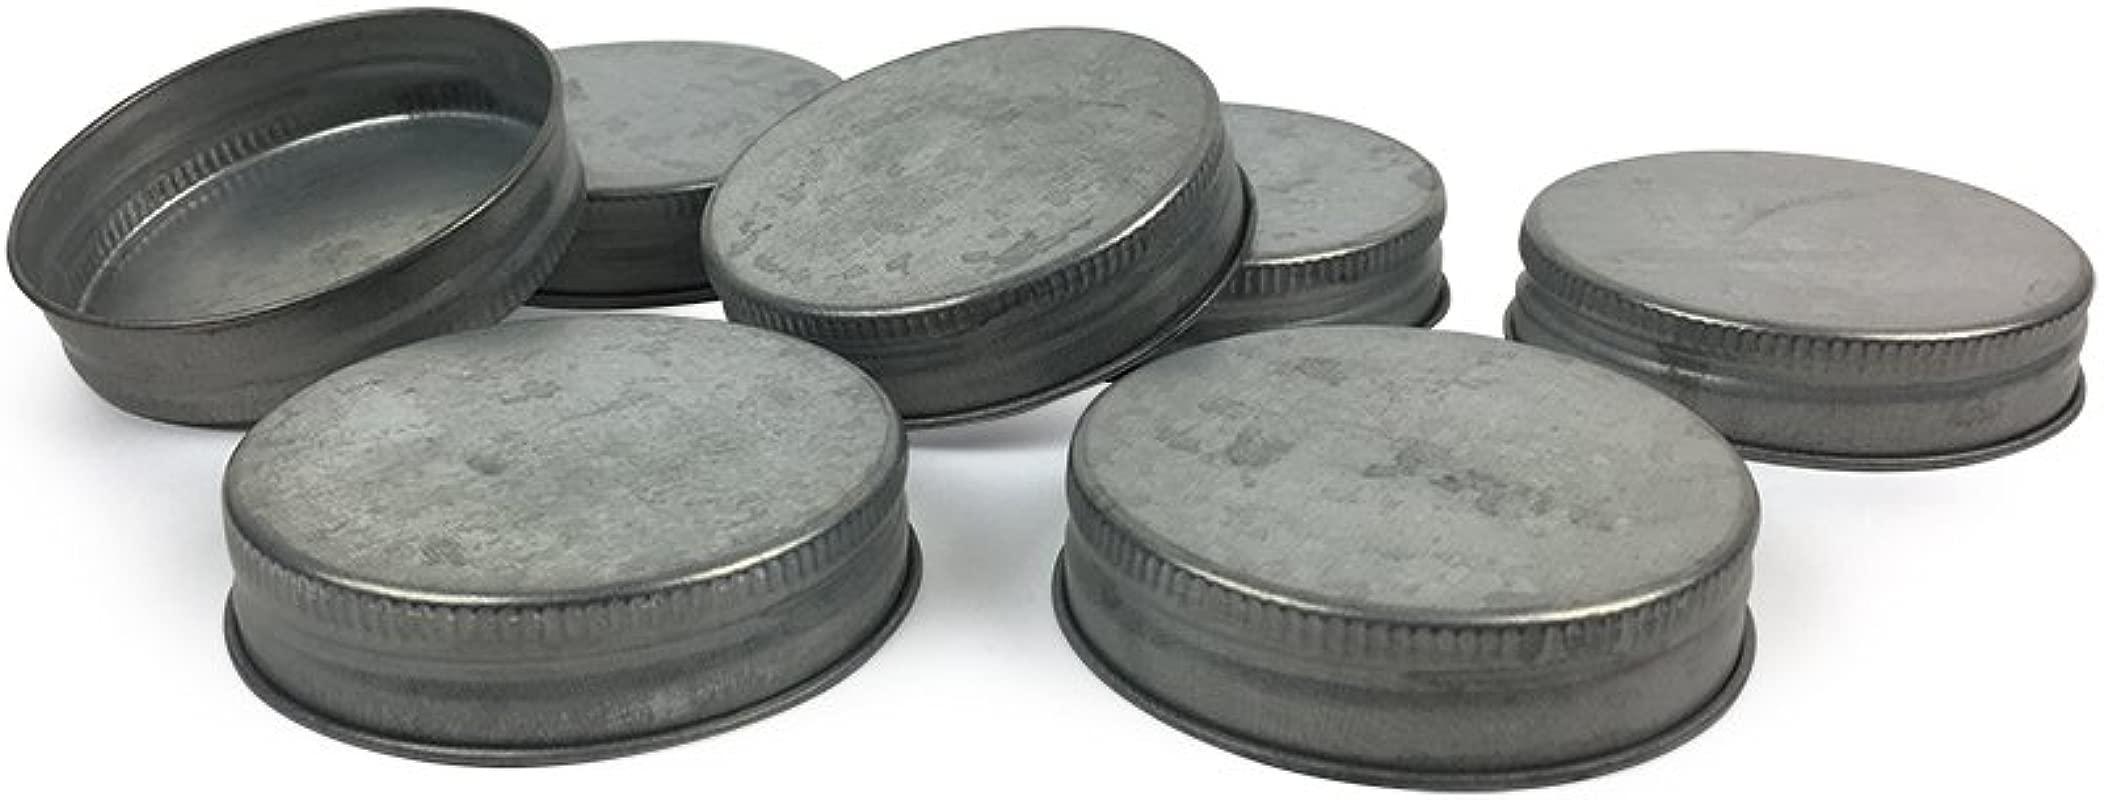 Mason Jar Lids Fits Standard Size Mason Jars Set Of 12